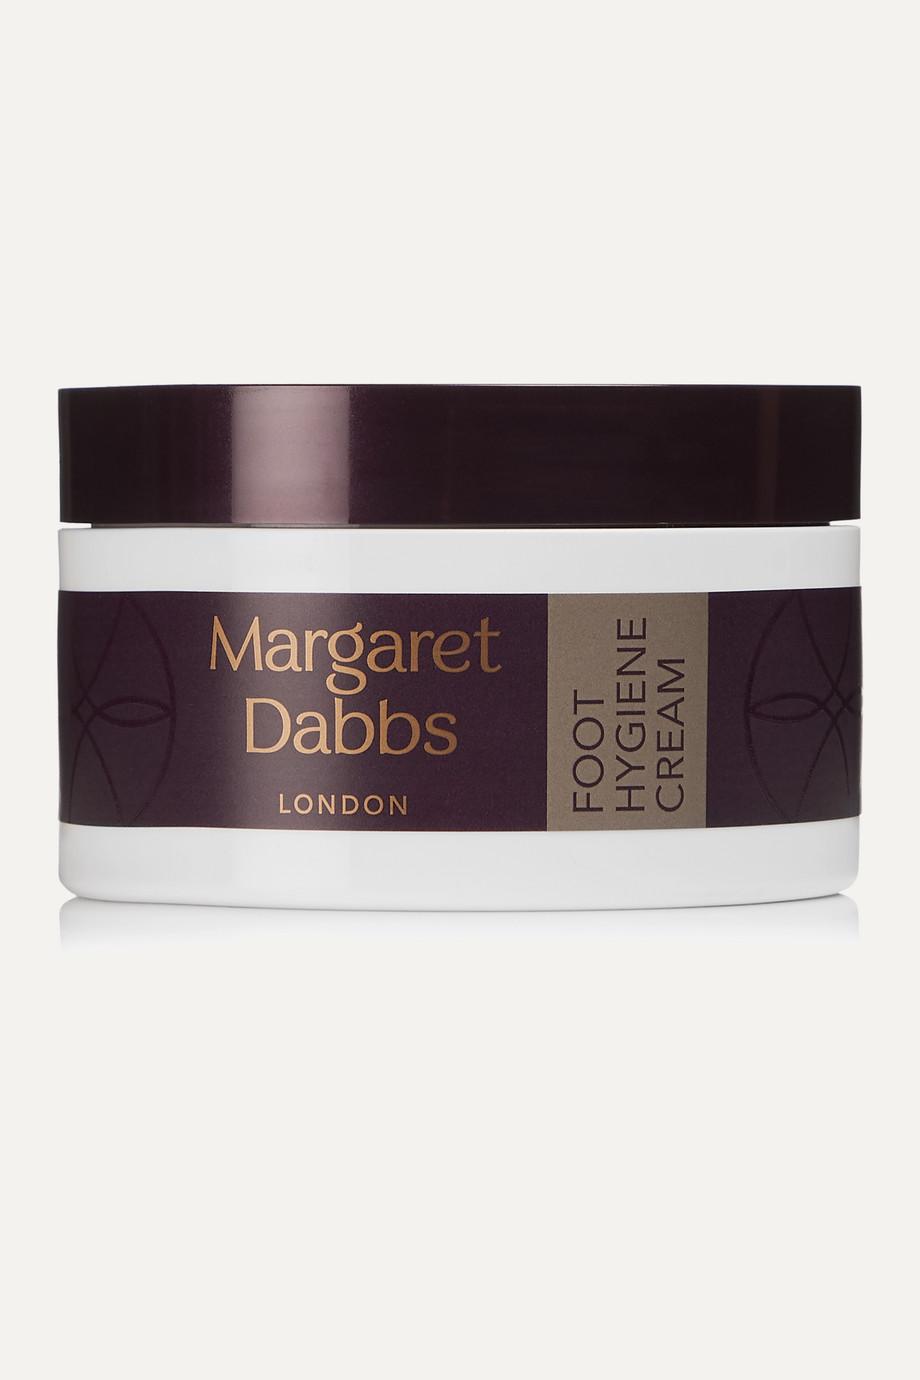 Margaret Dabbs London Foot Hygiene Cream, 100g